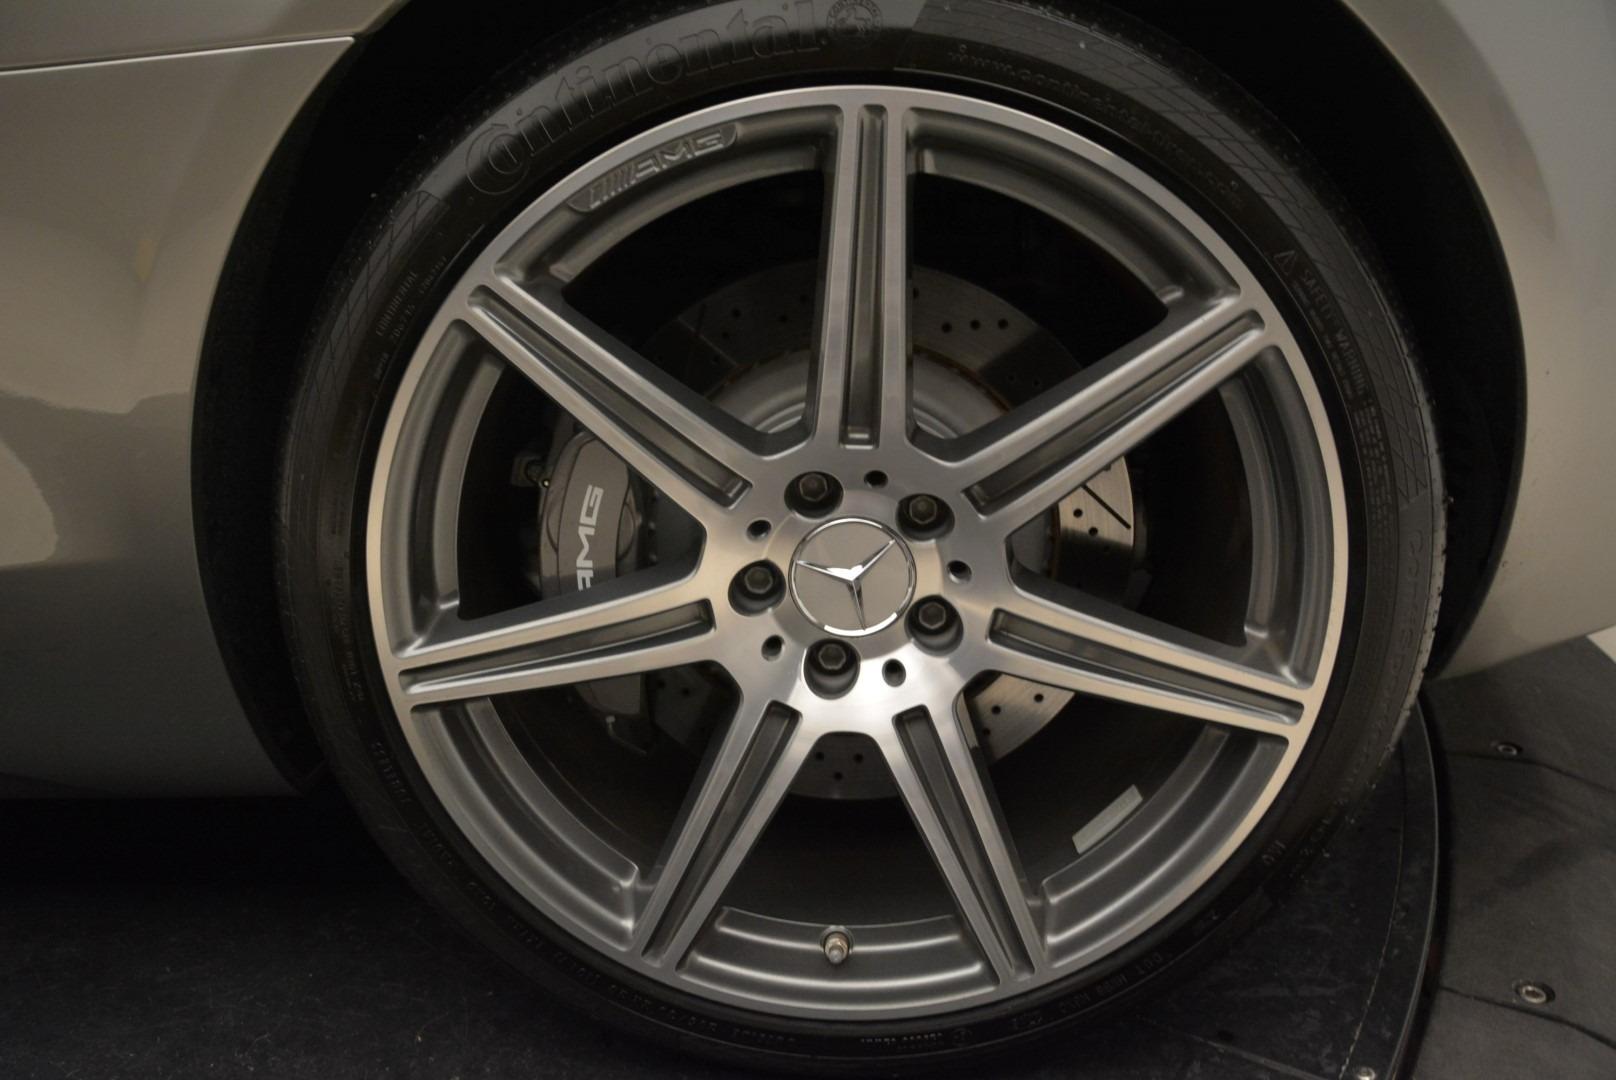 Used 2012 Mercedes-Benz SLS AMG  For Sale In Westport, CT 2068_p22